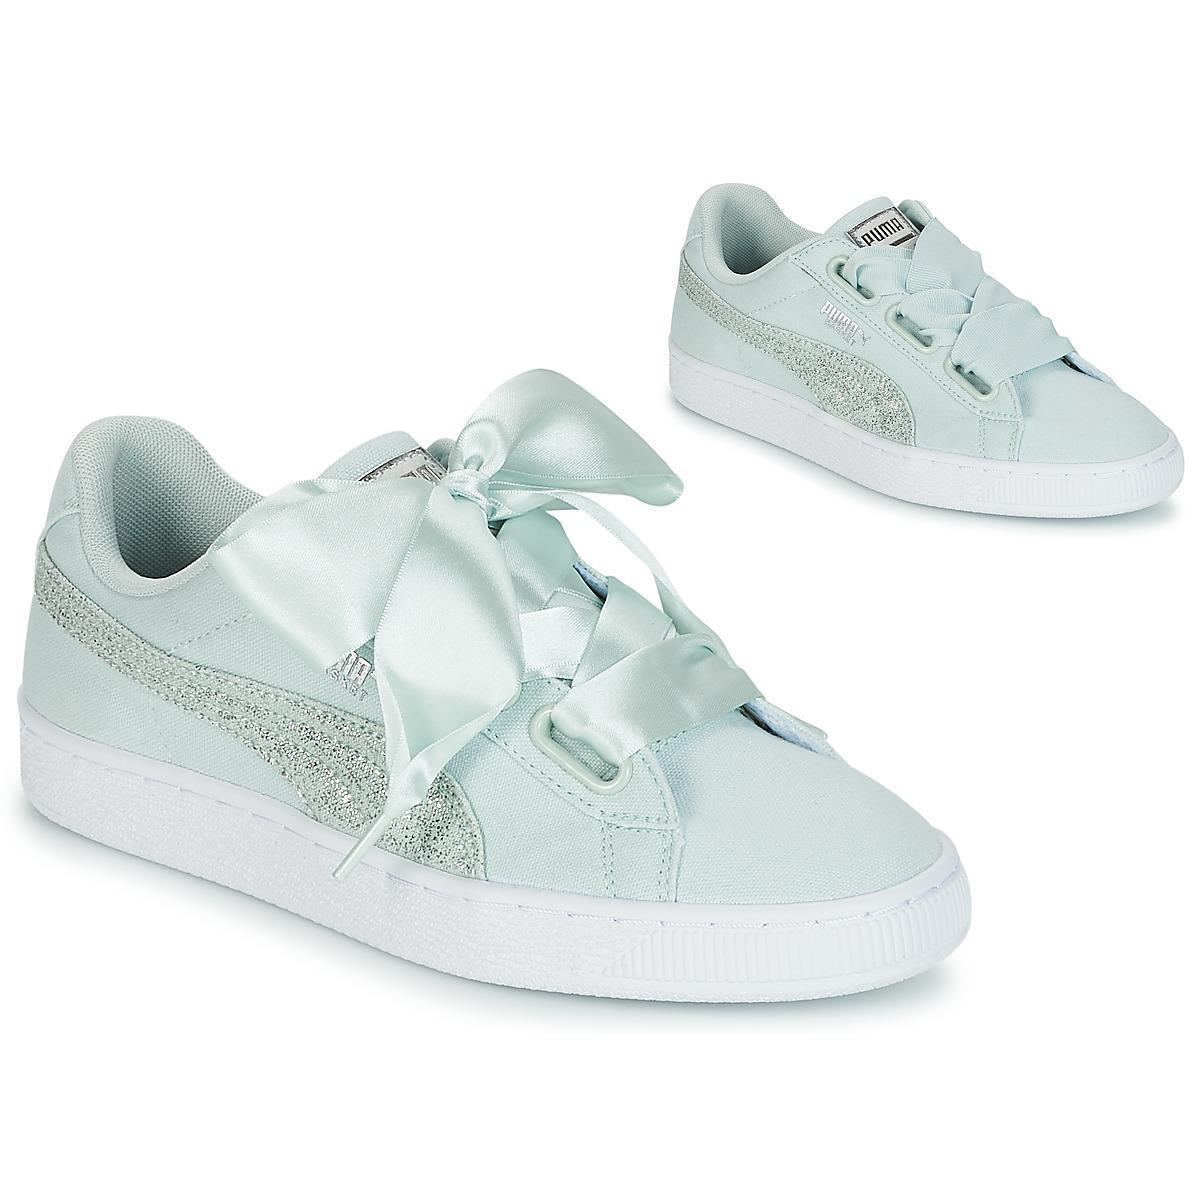 6b1bbefdd PUMA Basket Heart Canvas W's Shoes (trainers) in Green - Lyst